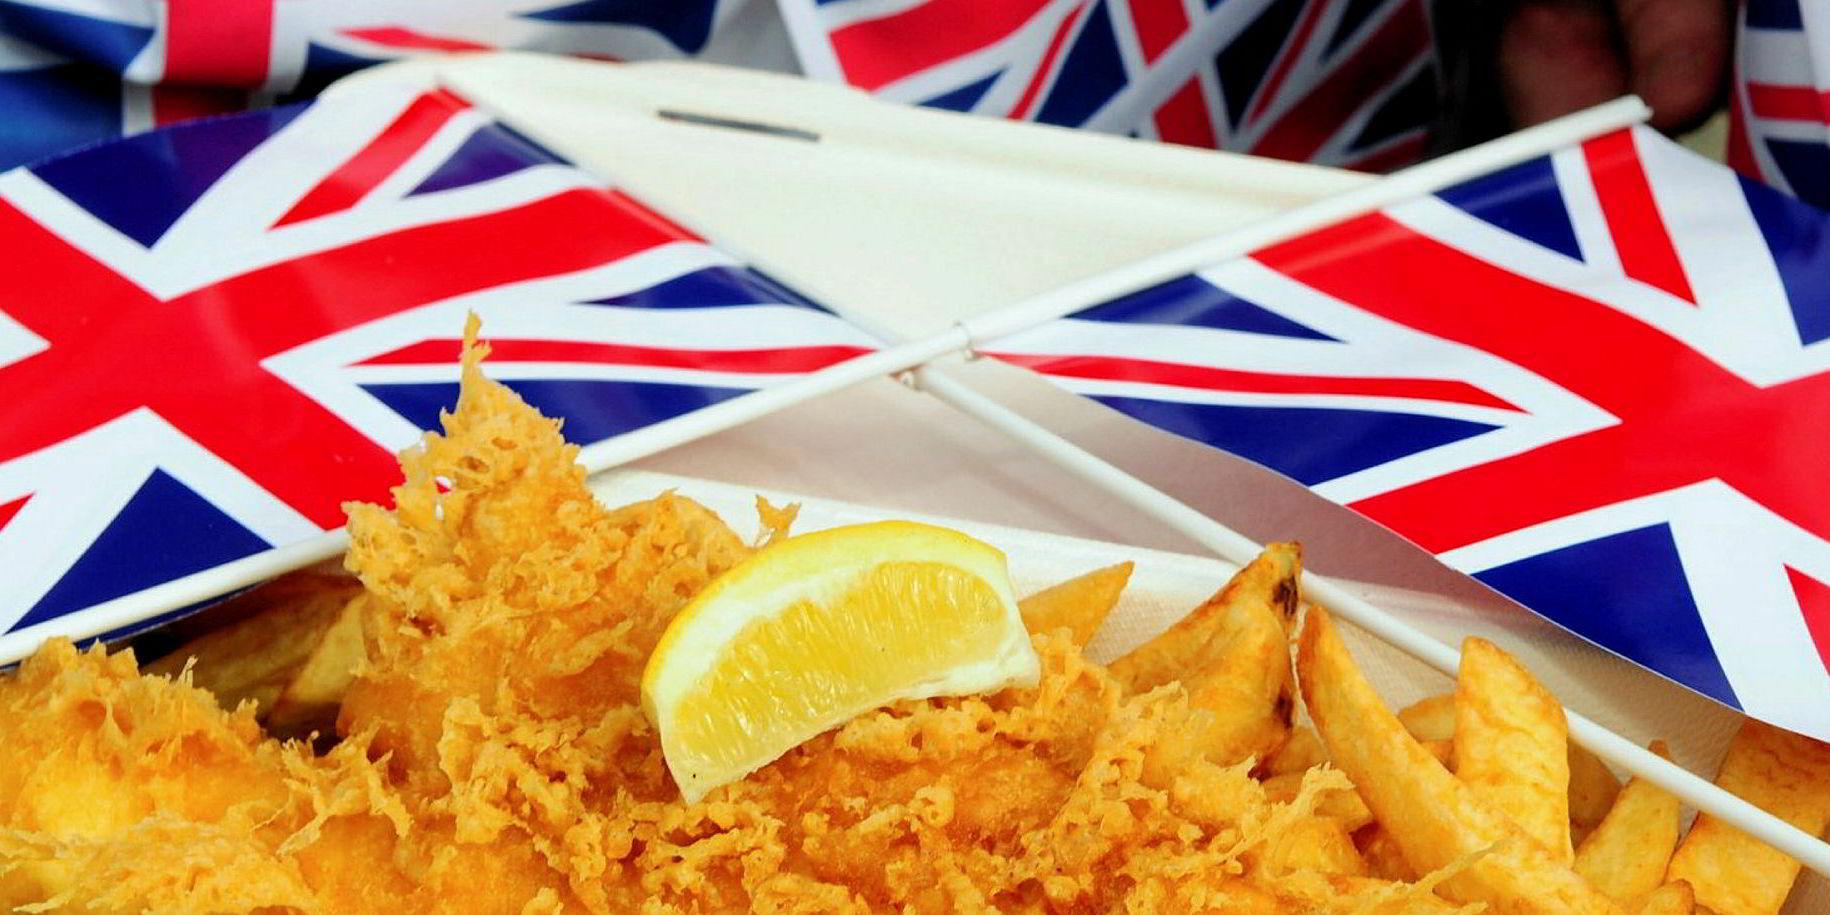 Stenger Fish Chips Marked I Storbritannia Fiskeribladet